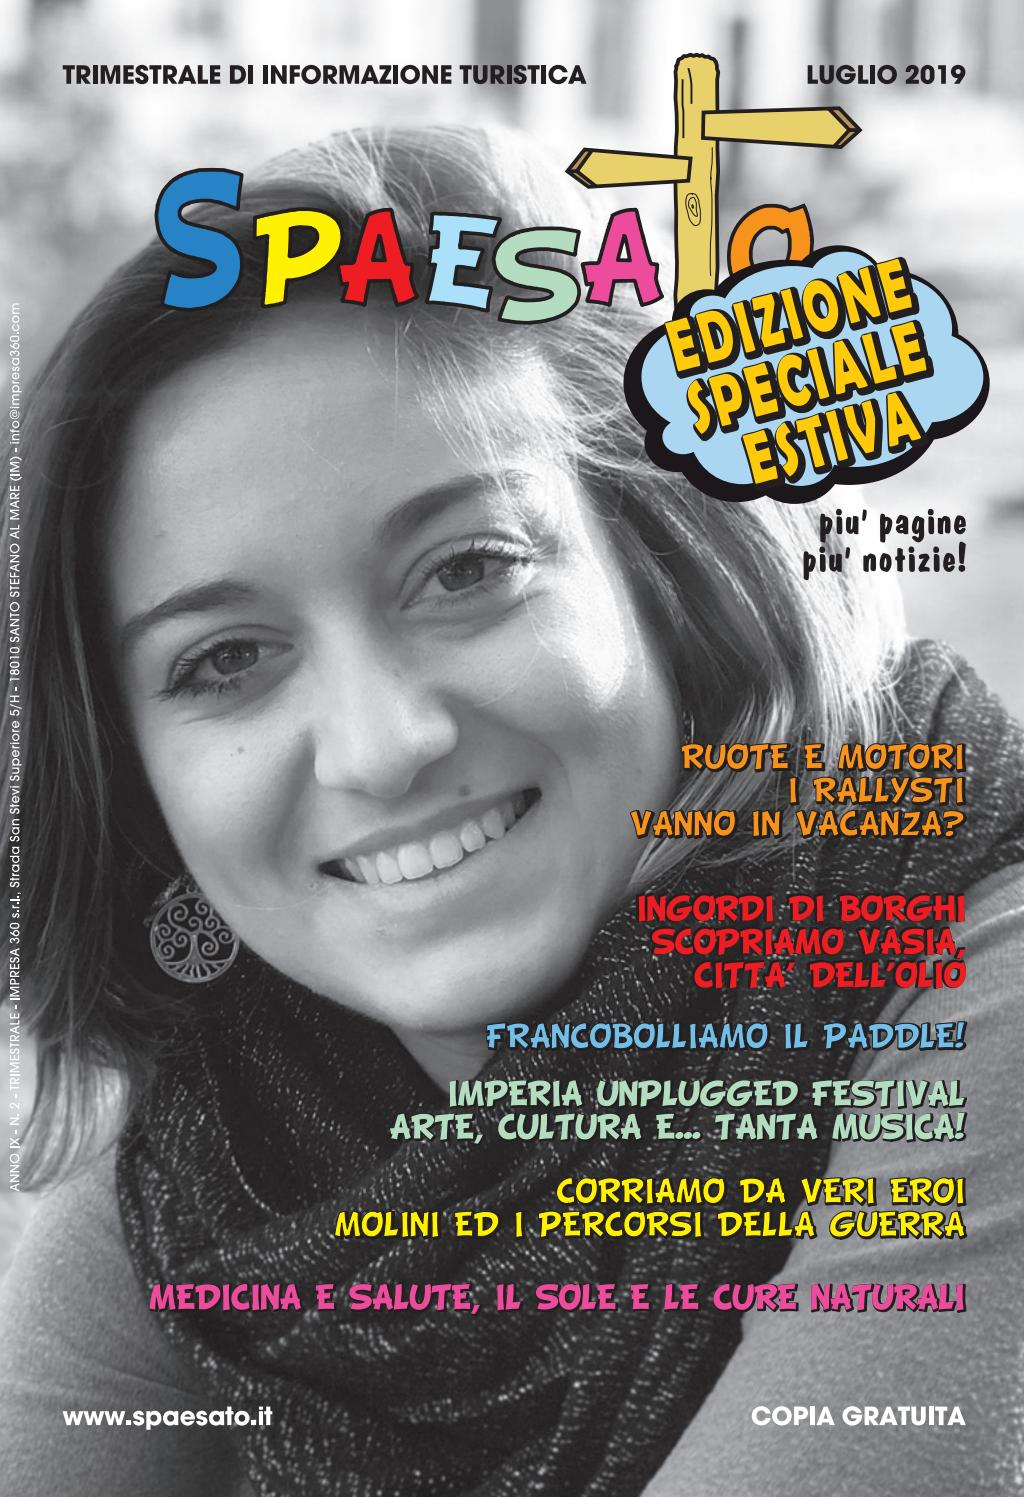 vendite all'ingrosso all'ingrosso migliore online Spaesato T34 by Luigi Esposito - issuu